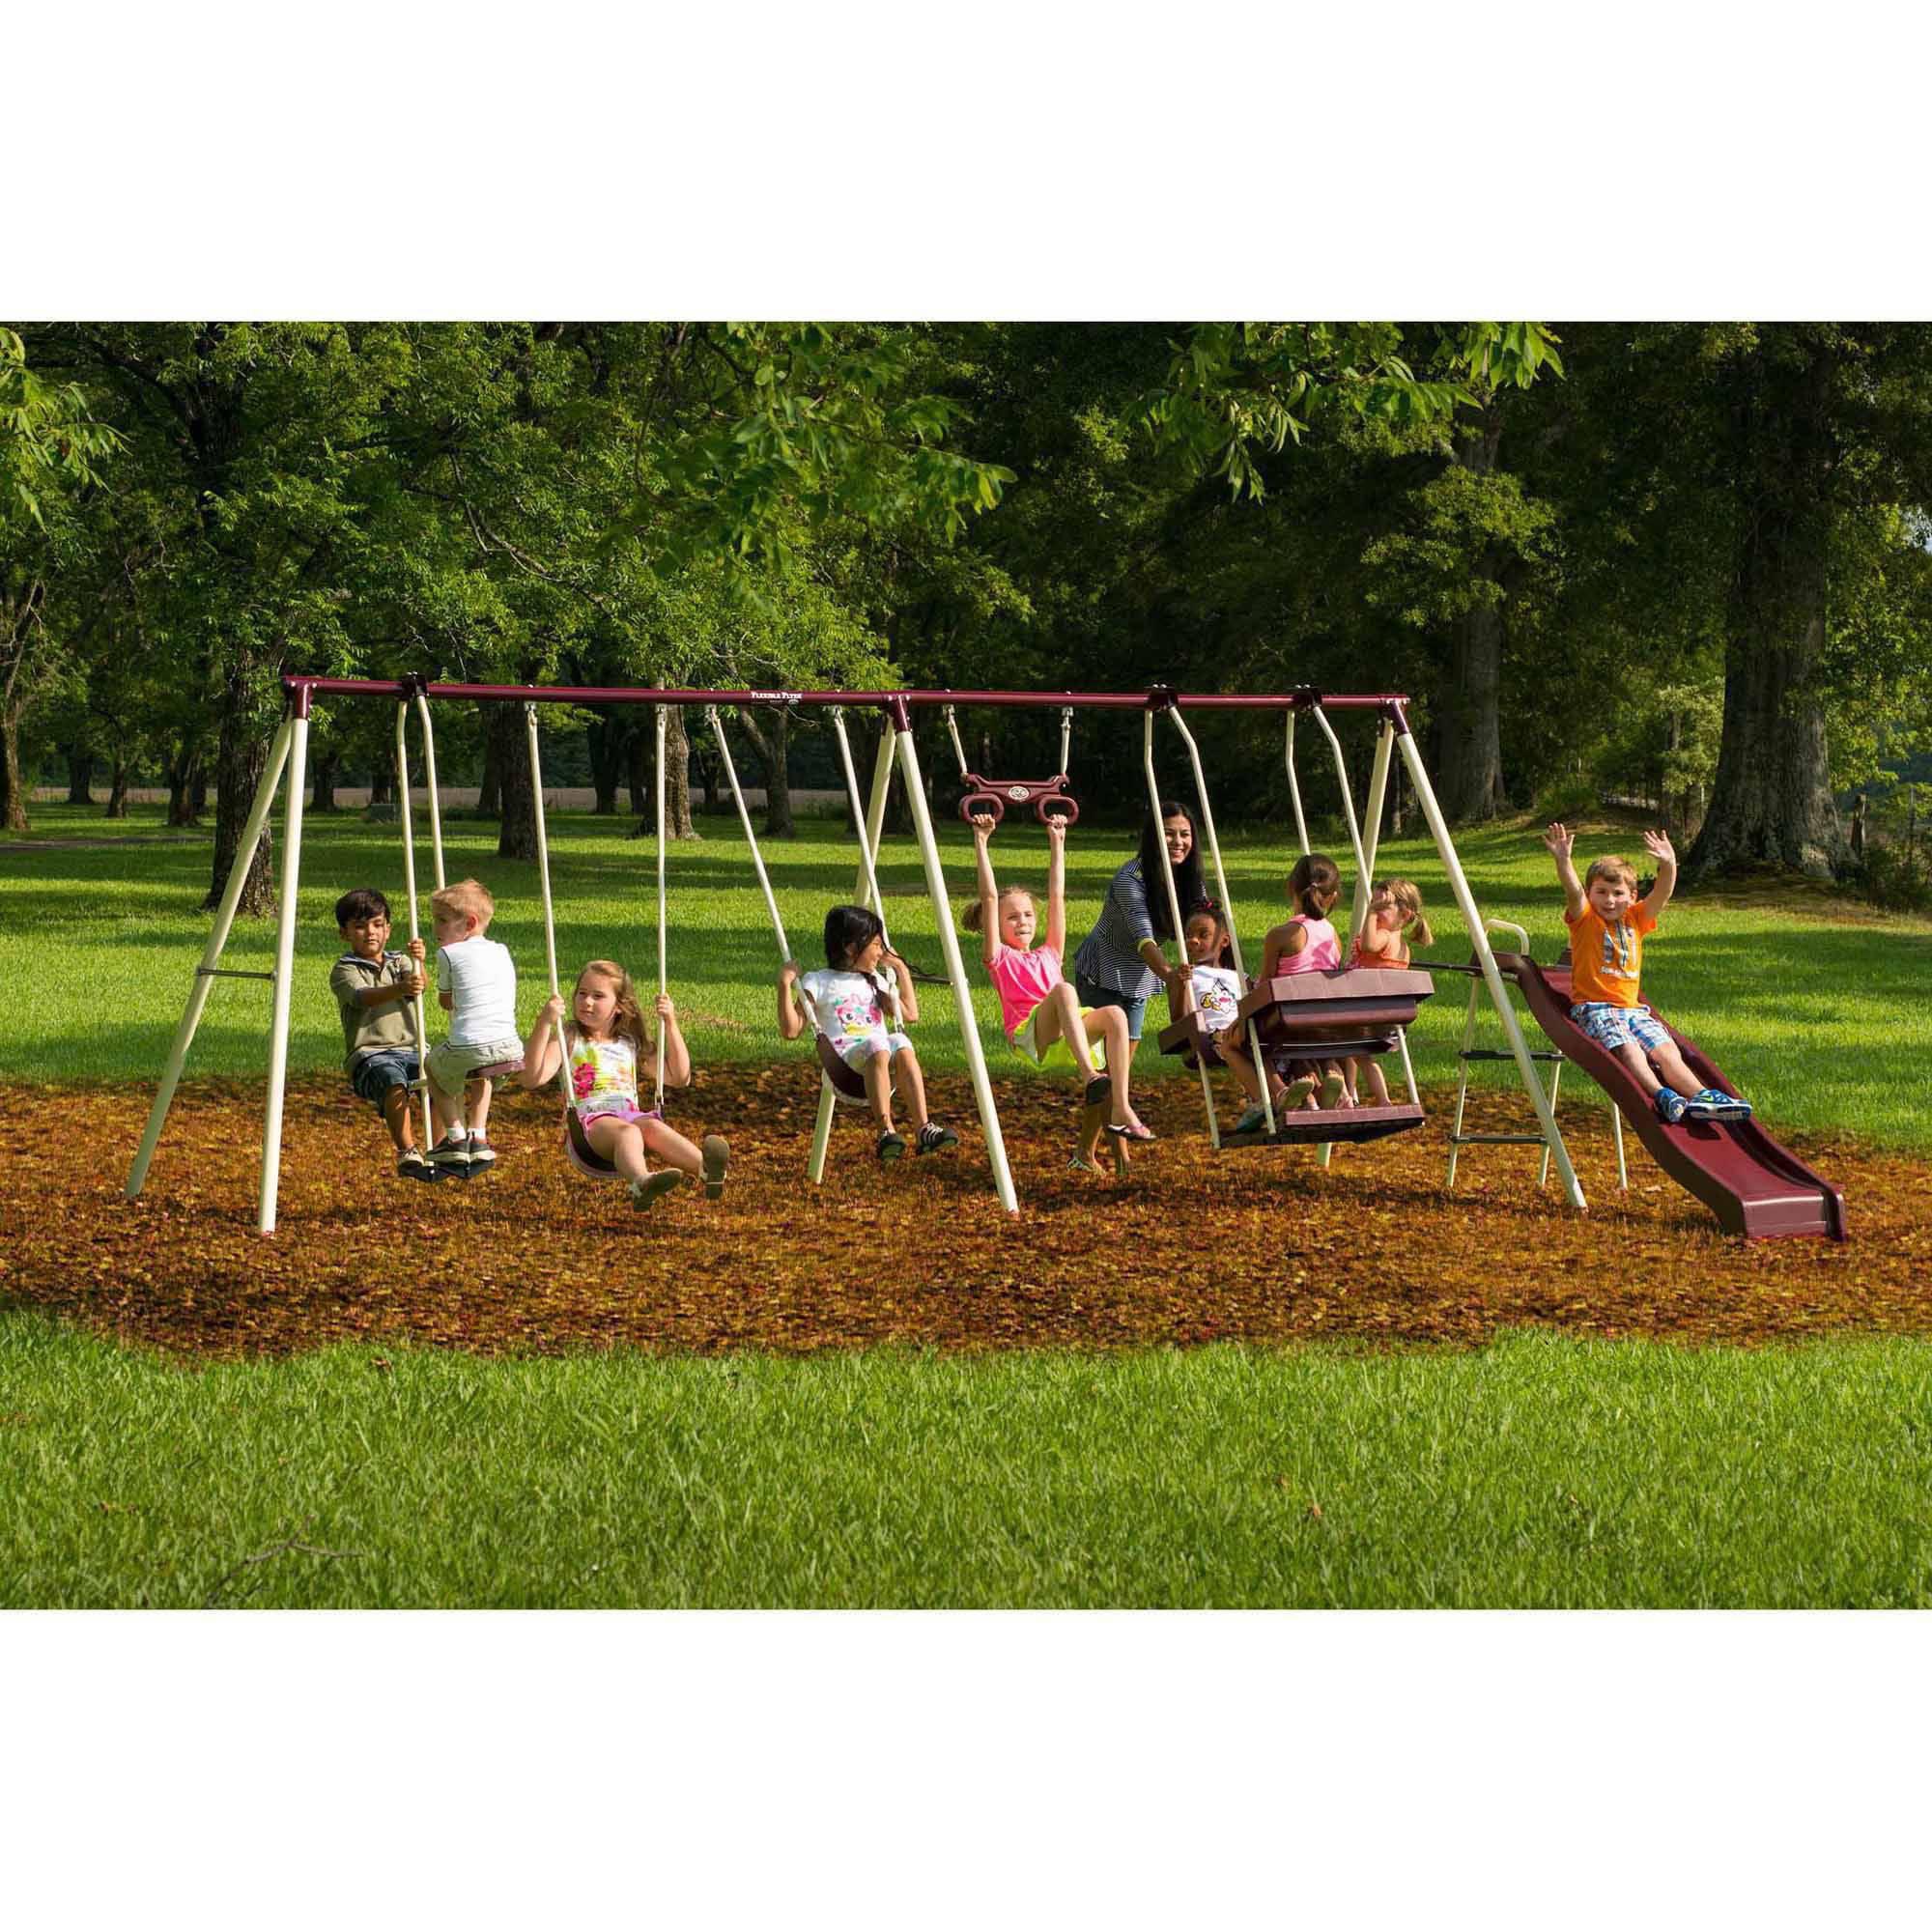 Flexible Flyer Play Park Metal Swing Set